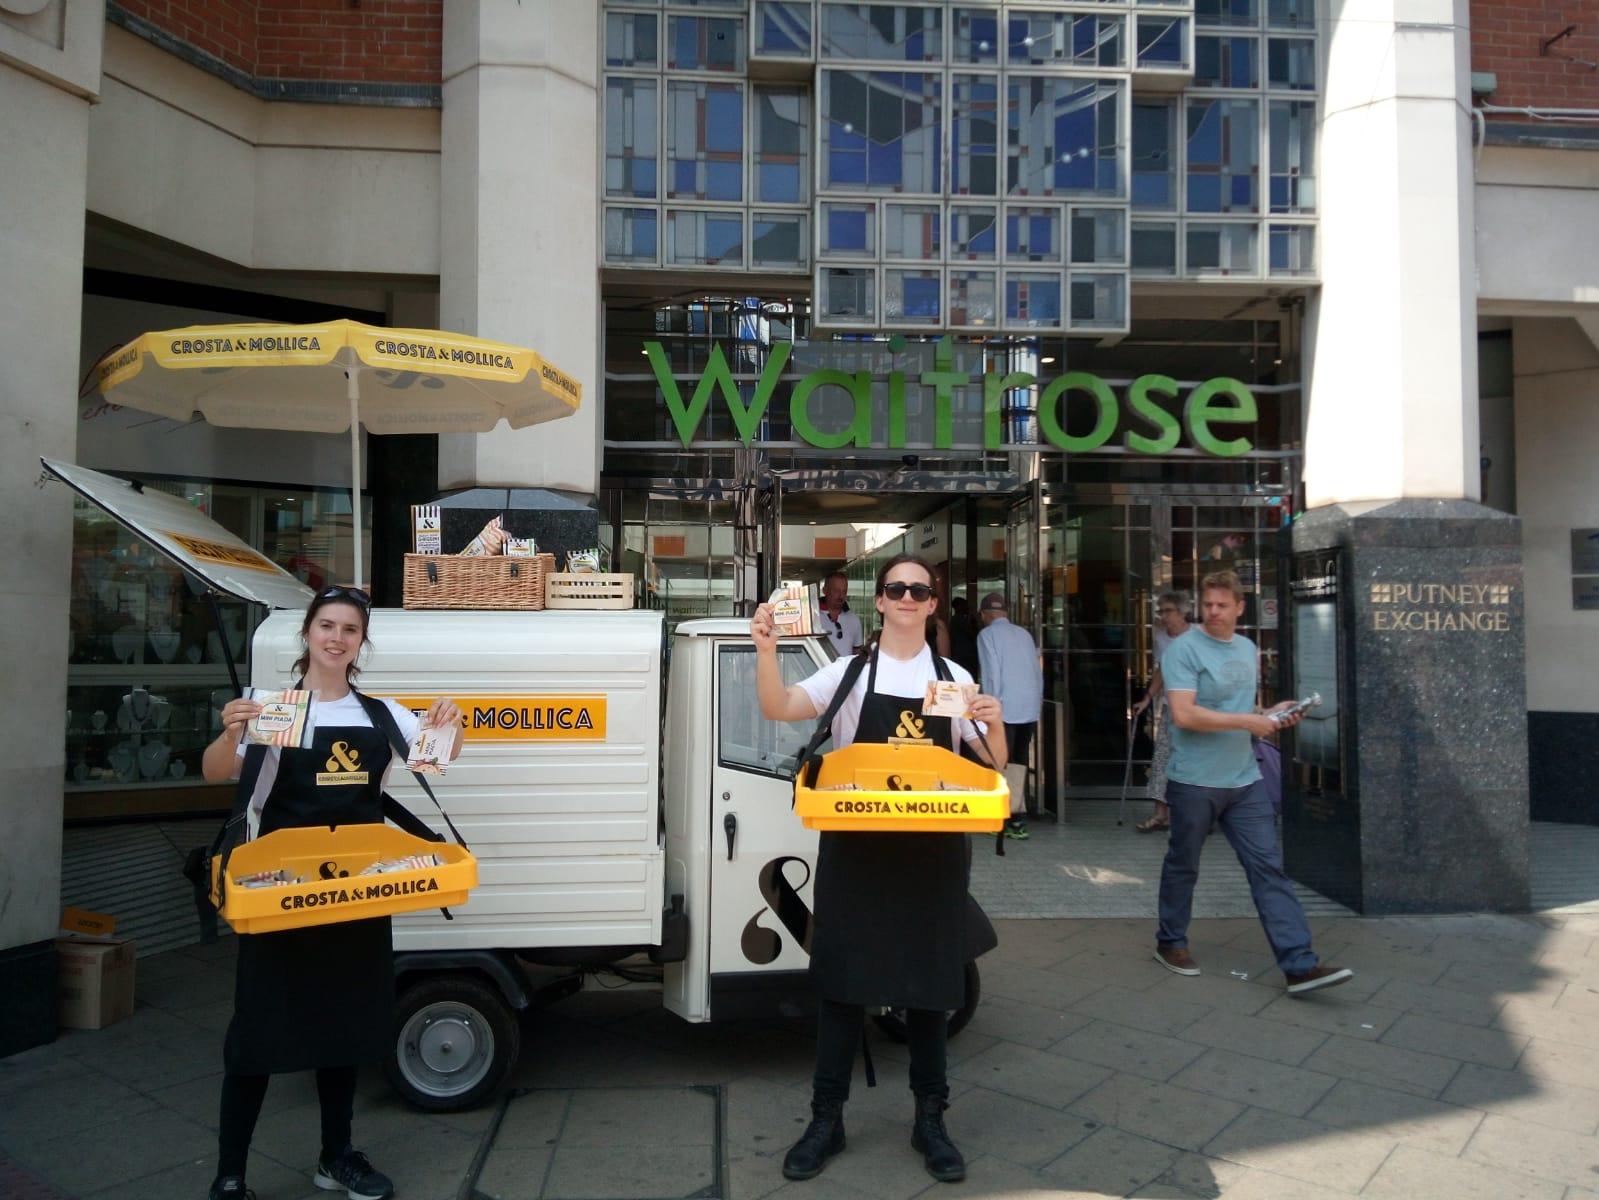 Crosta & Mollica - Suburban Street Sampling at Waitrose supermarket, Waitrose marketing, Waitrose product sampling, shopper marketing agency, retail marketing agency, examples